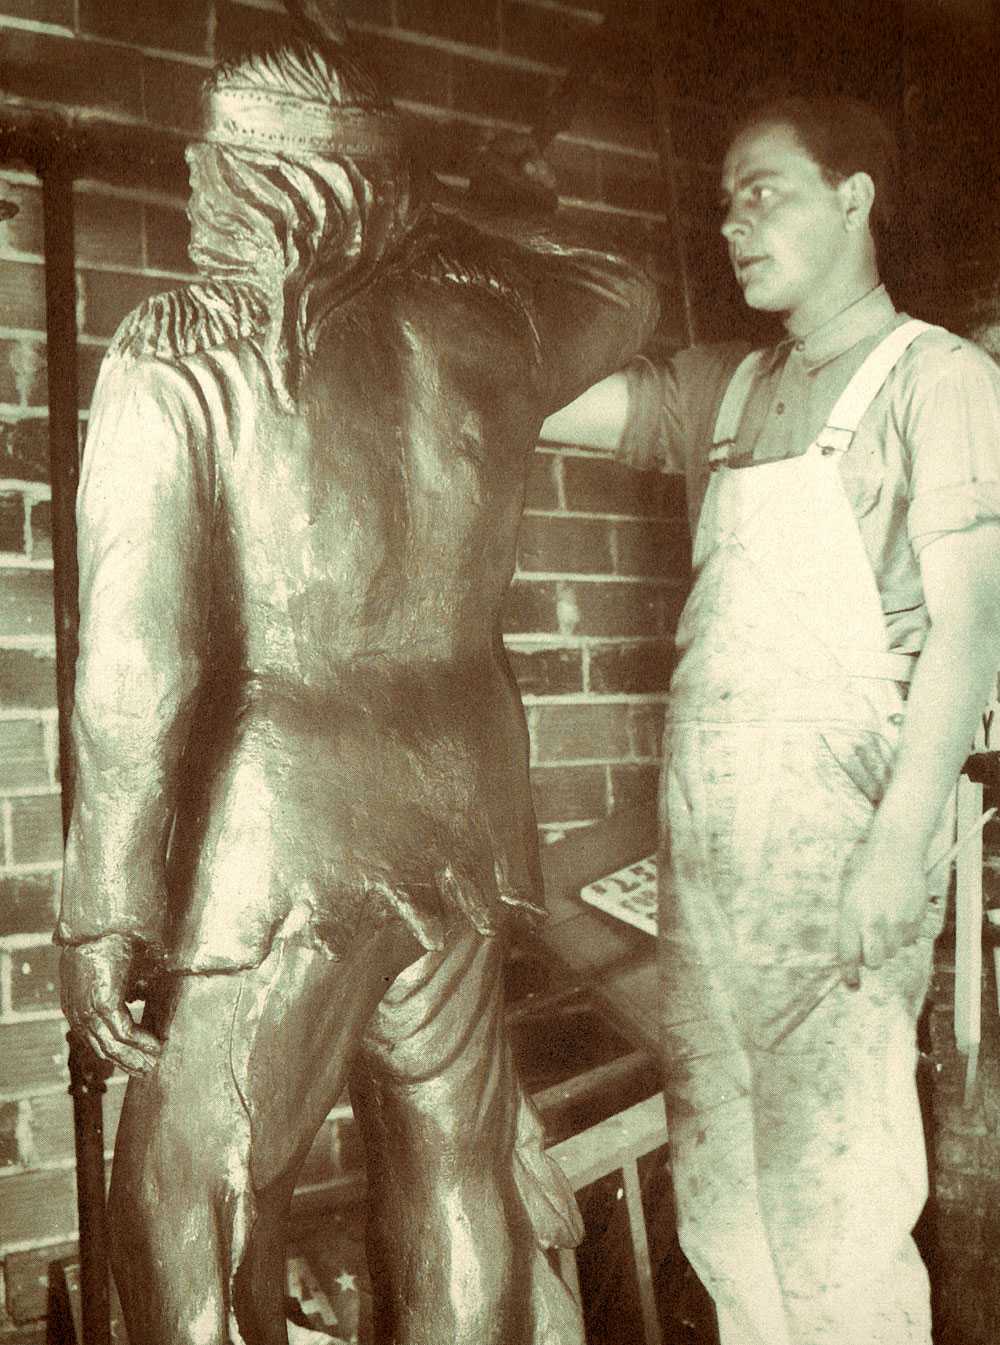 Les Kouba's First Statue of Little Crow in 1937